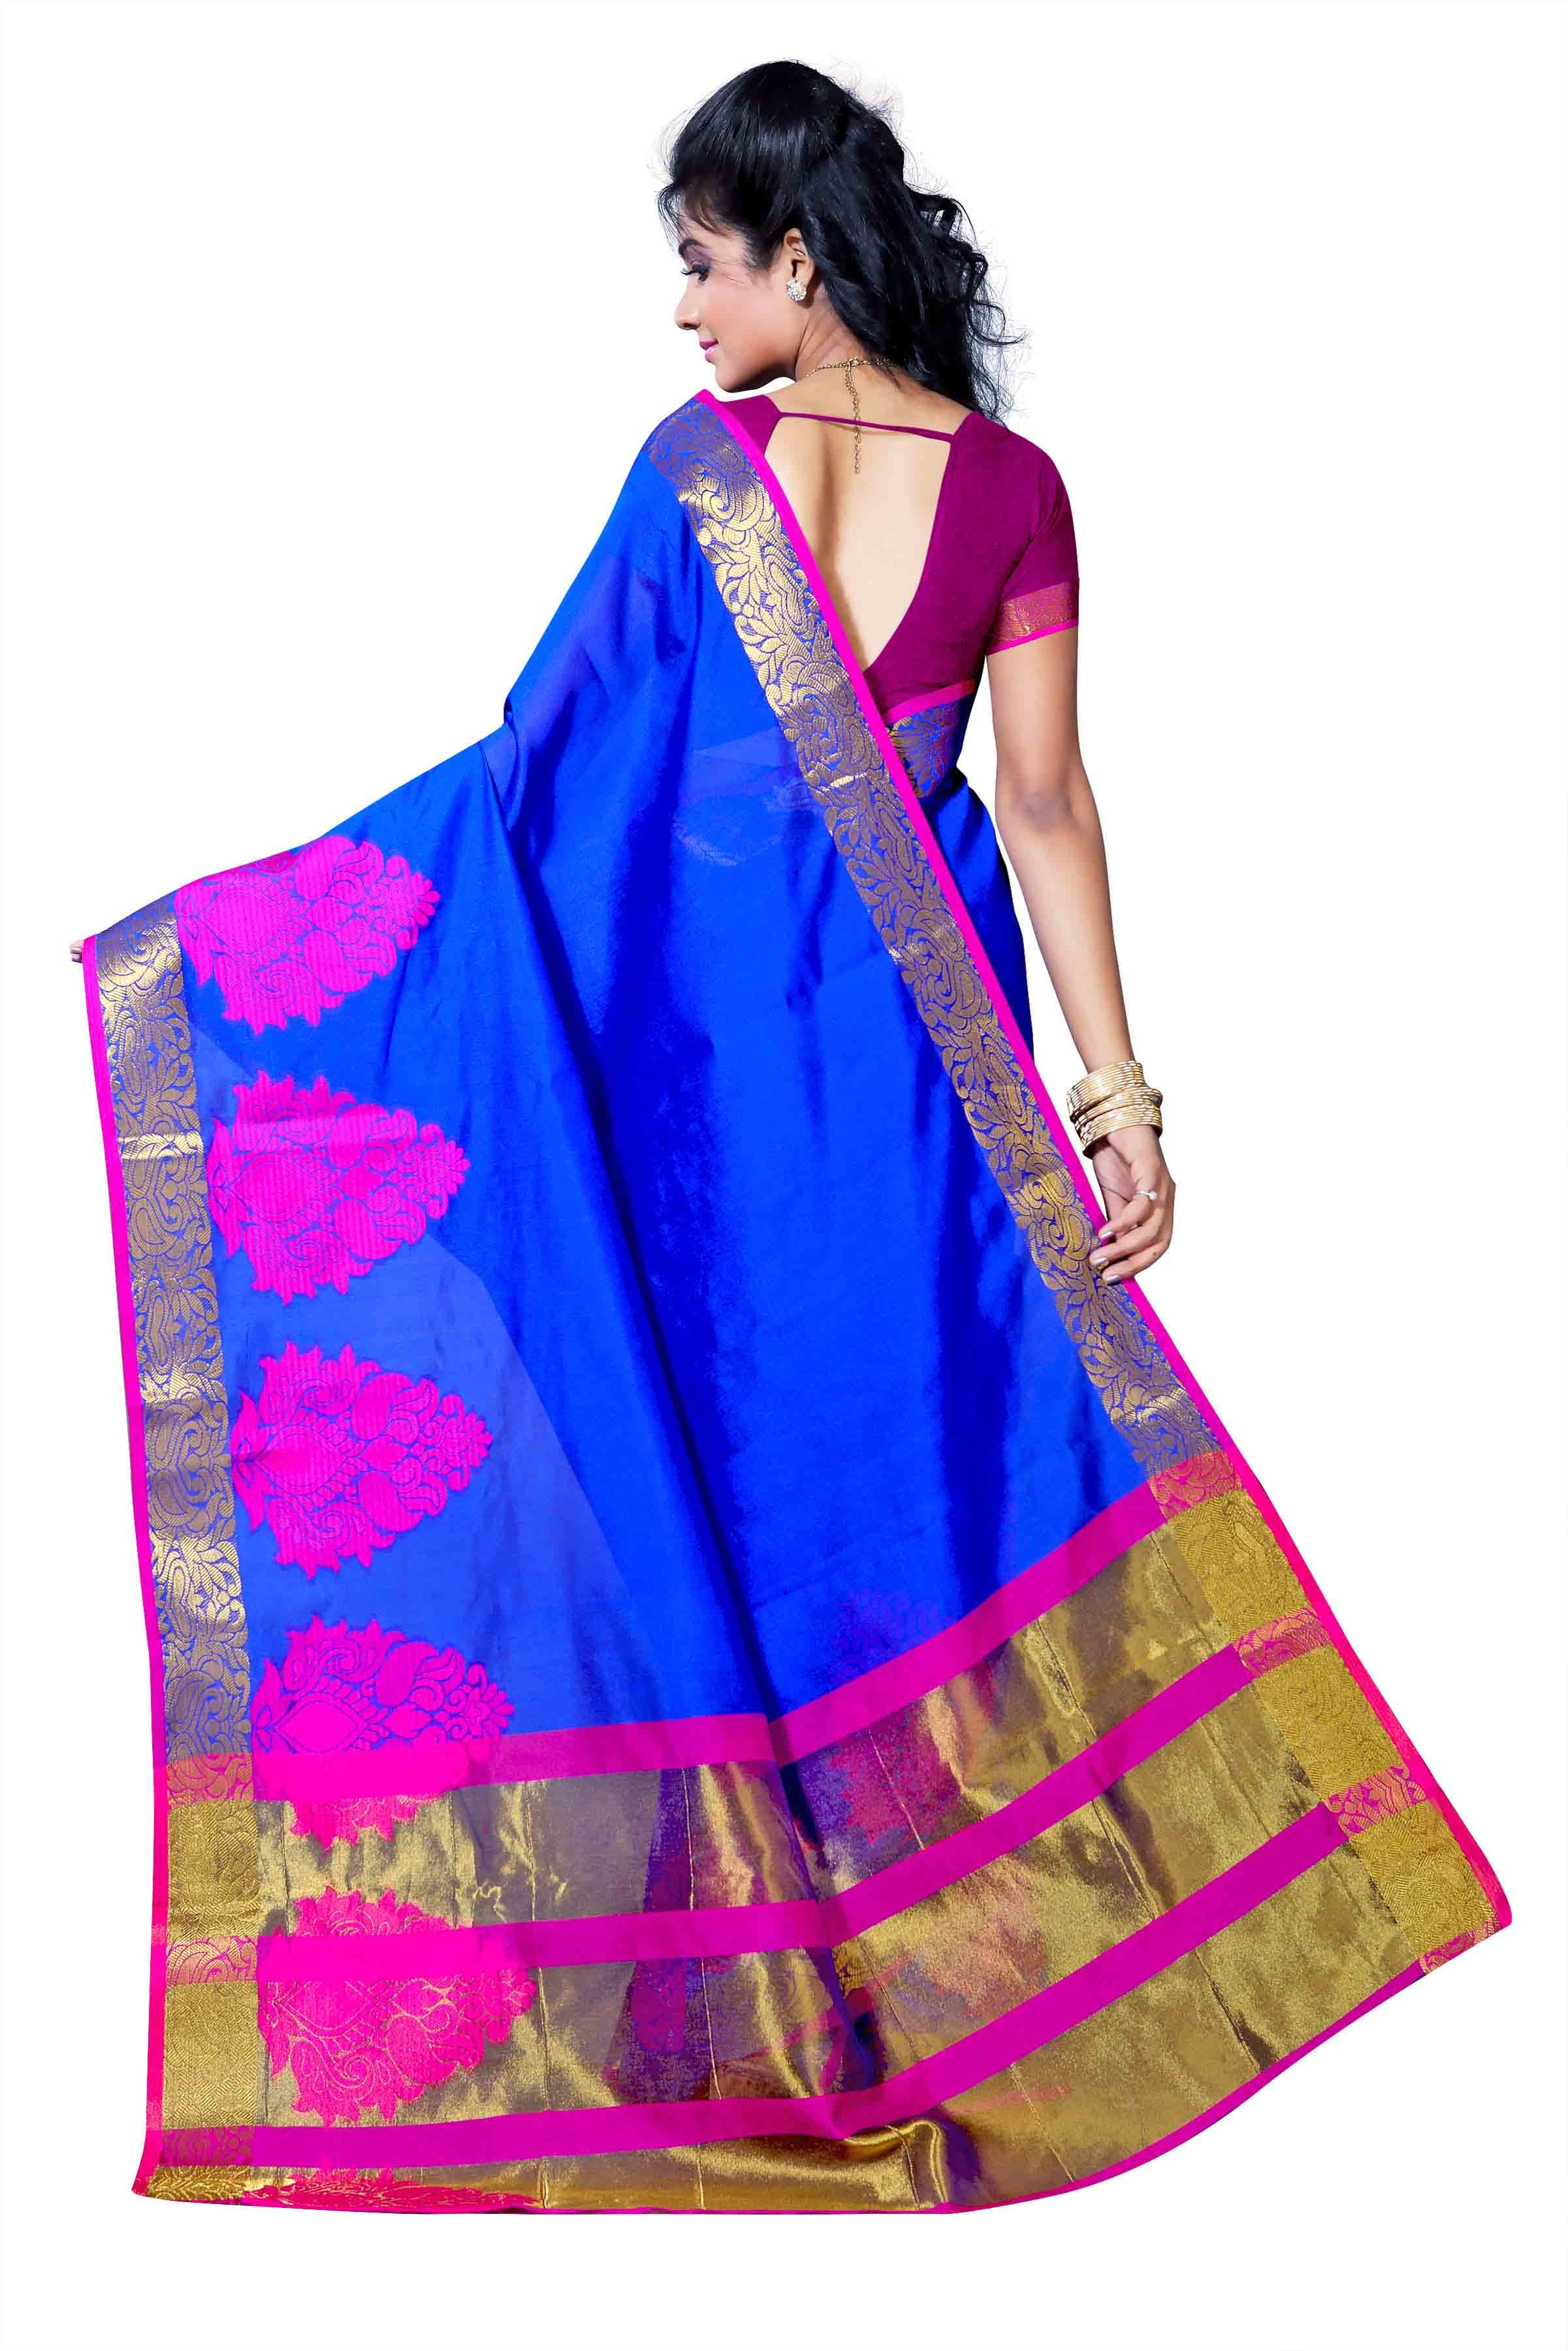 Kanchipuram Polycotton Skirt Butta Chitpallu Saree